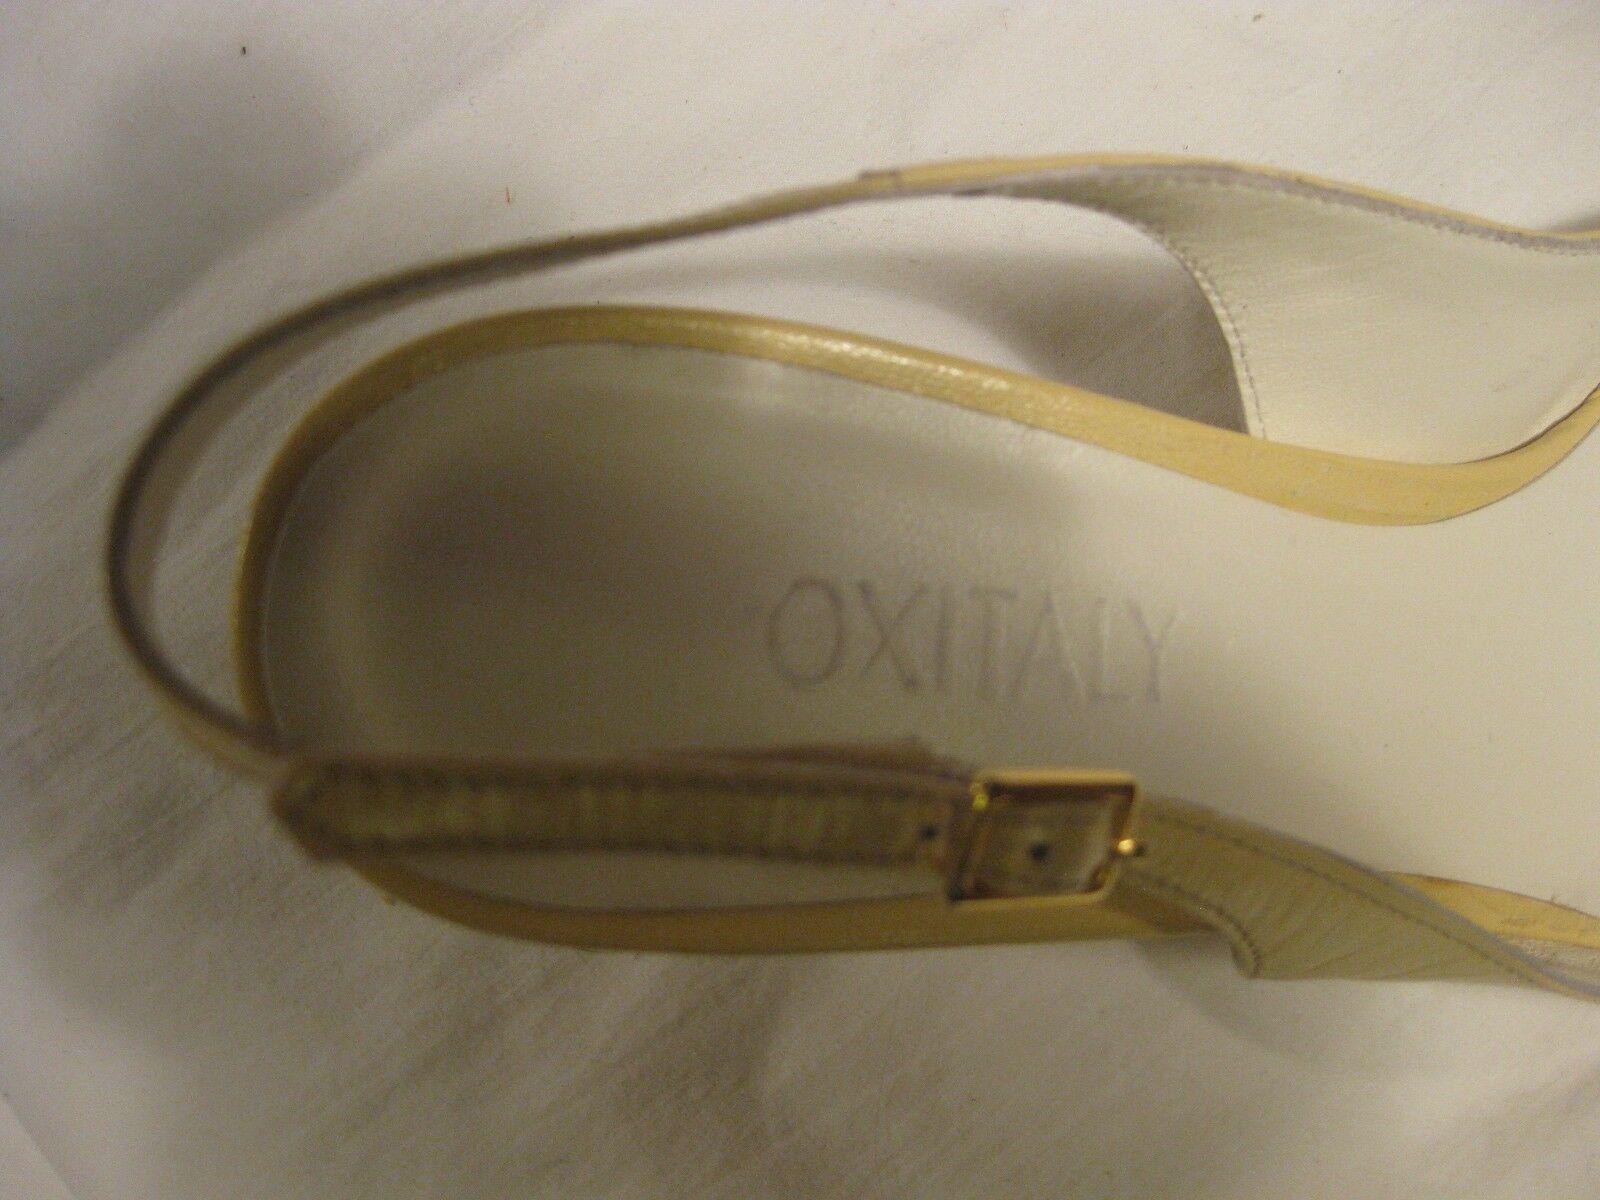 Oxytaly  Sz Pointed Toe Slingback Pumps Sz  39.5 488050